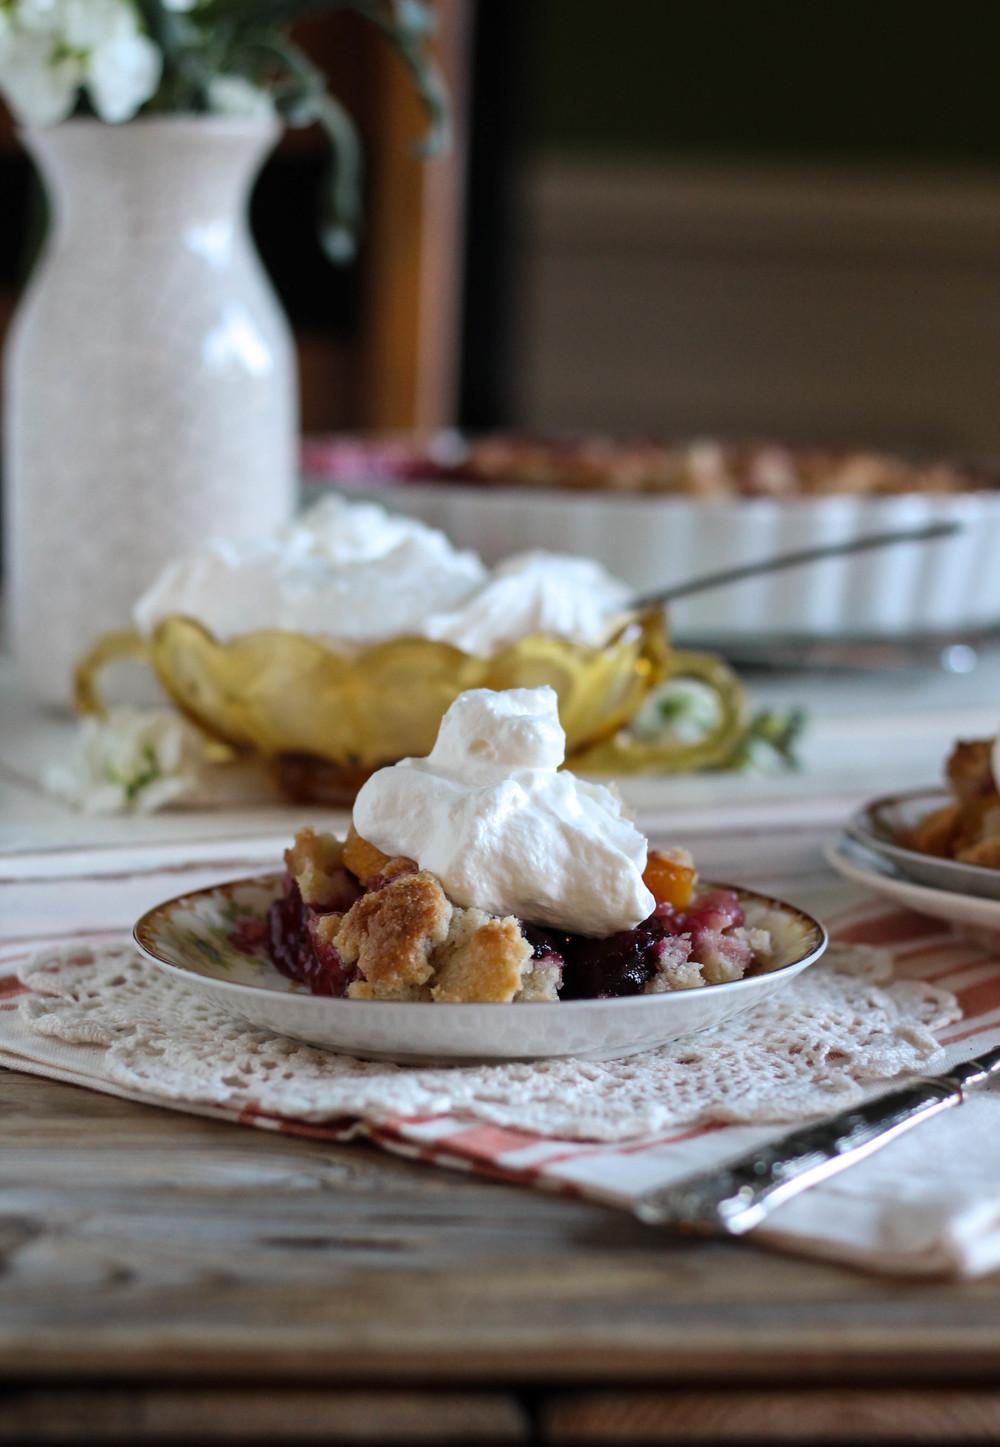 Peach & Cherry Cornmeal Cobbler with Rum Whipped Cream {Pedantic Foodie}